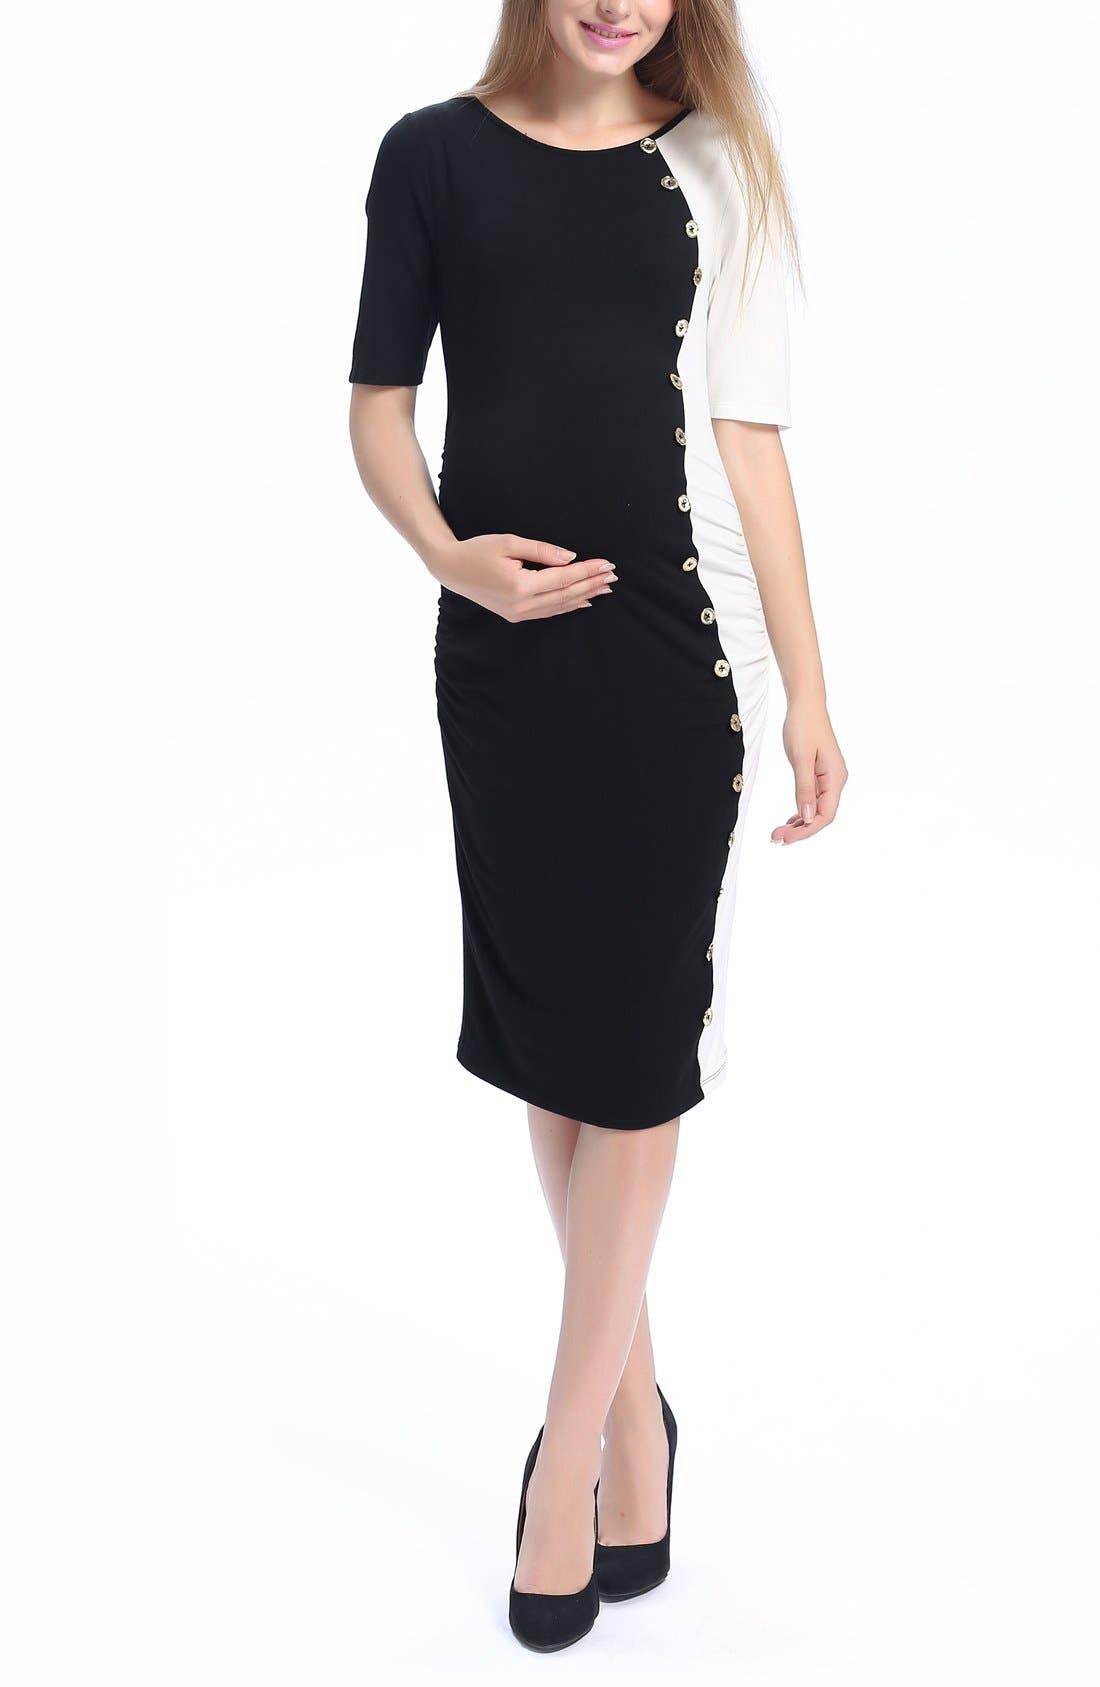 Daphne Colorblock Maternity Dress,                             Main thumbnail 1, color,                             Black/ White